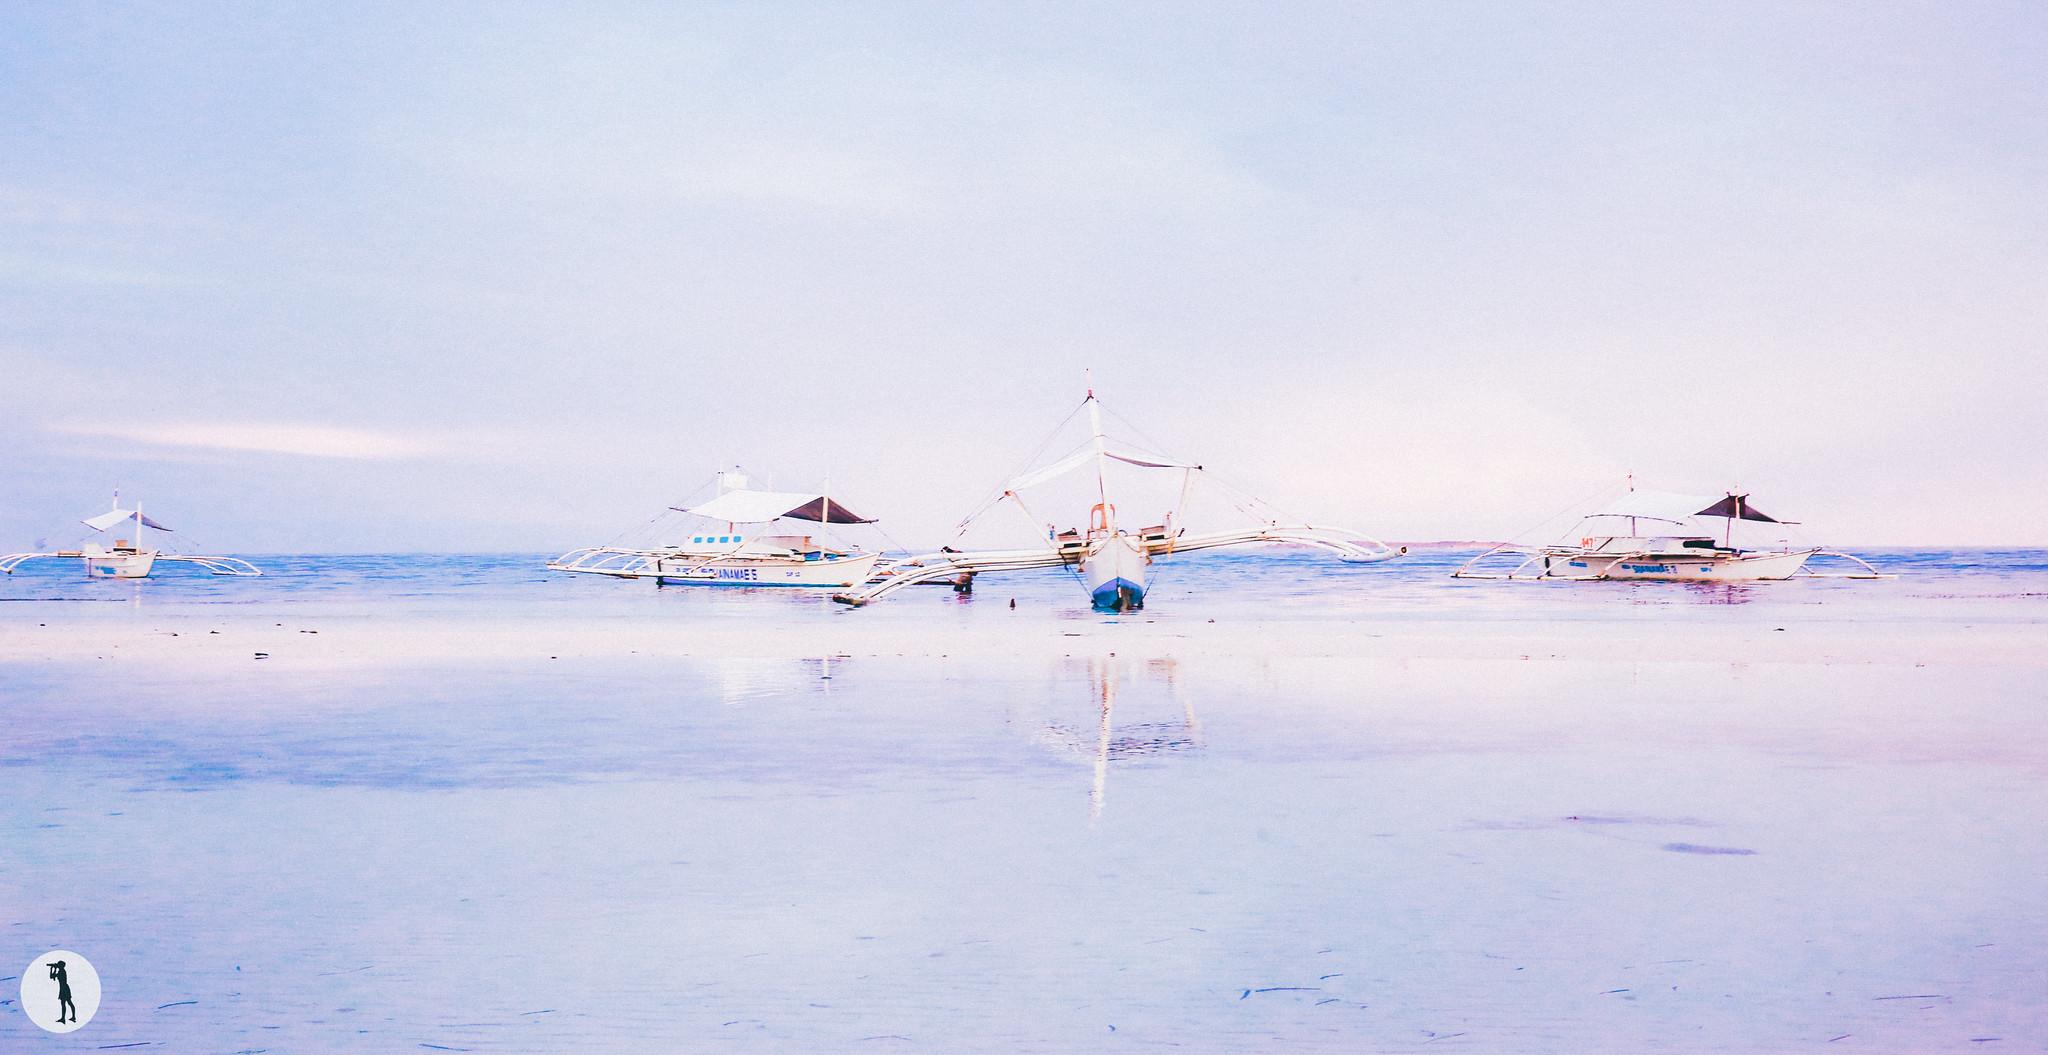 Travel to the Philippines - Panglao Island